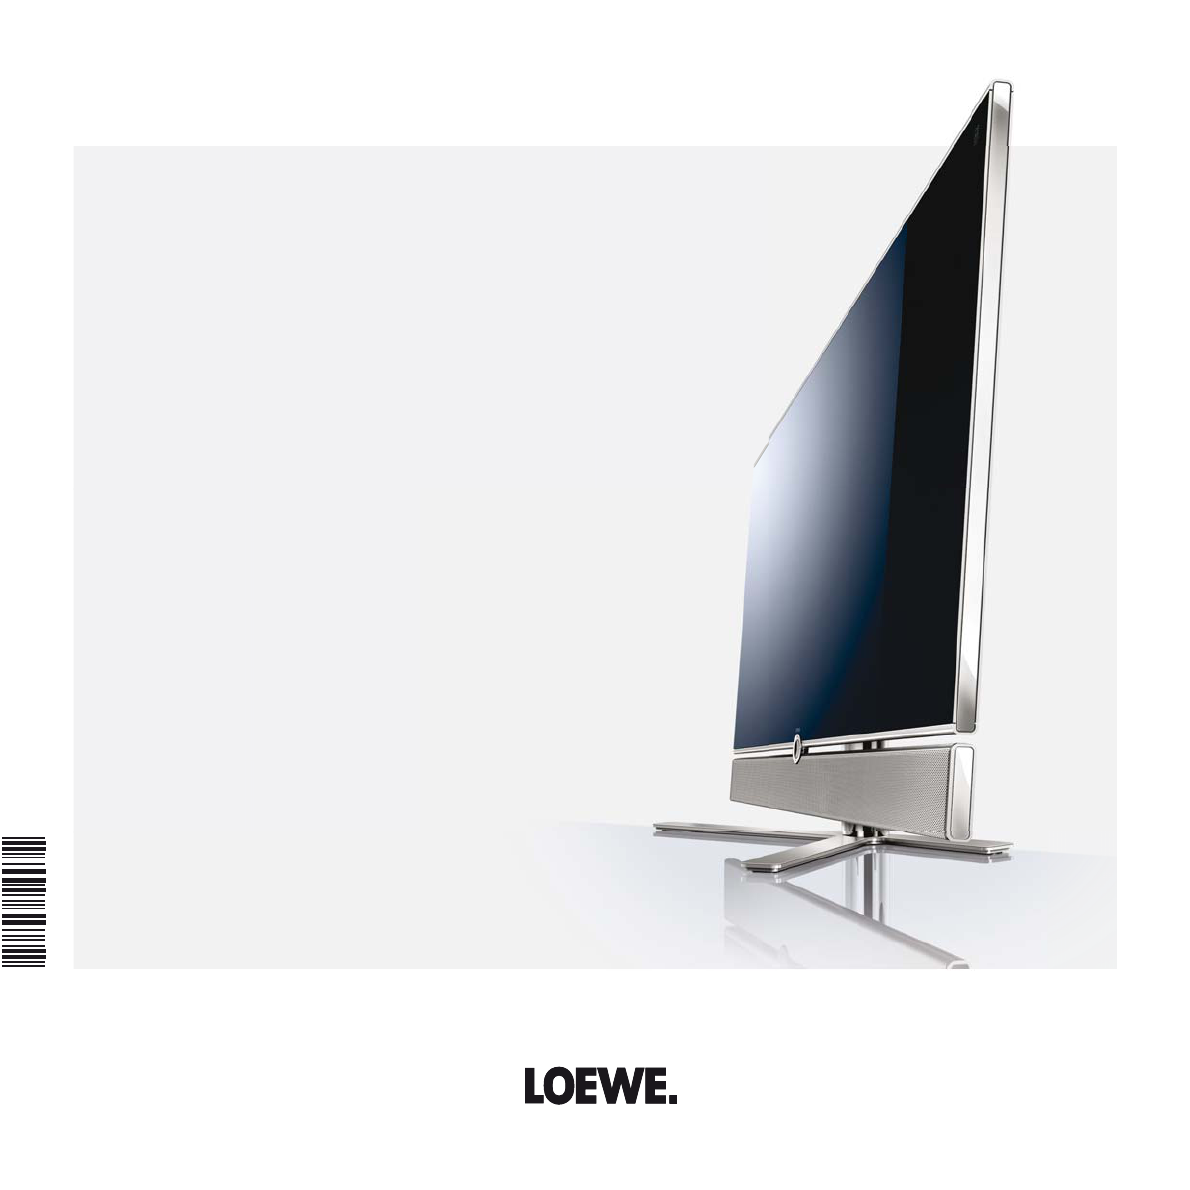 handleiding loewe individual 32 compose sound led pagina. Black Bedroom Furniture Sets. Home Design Ideas